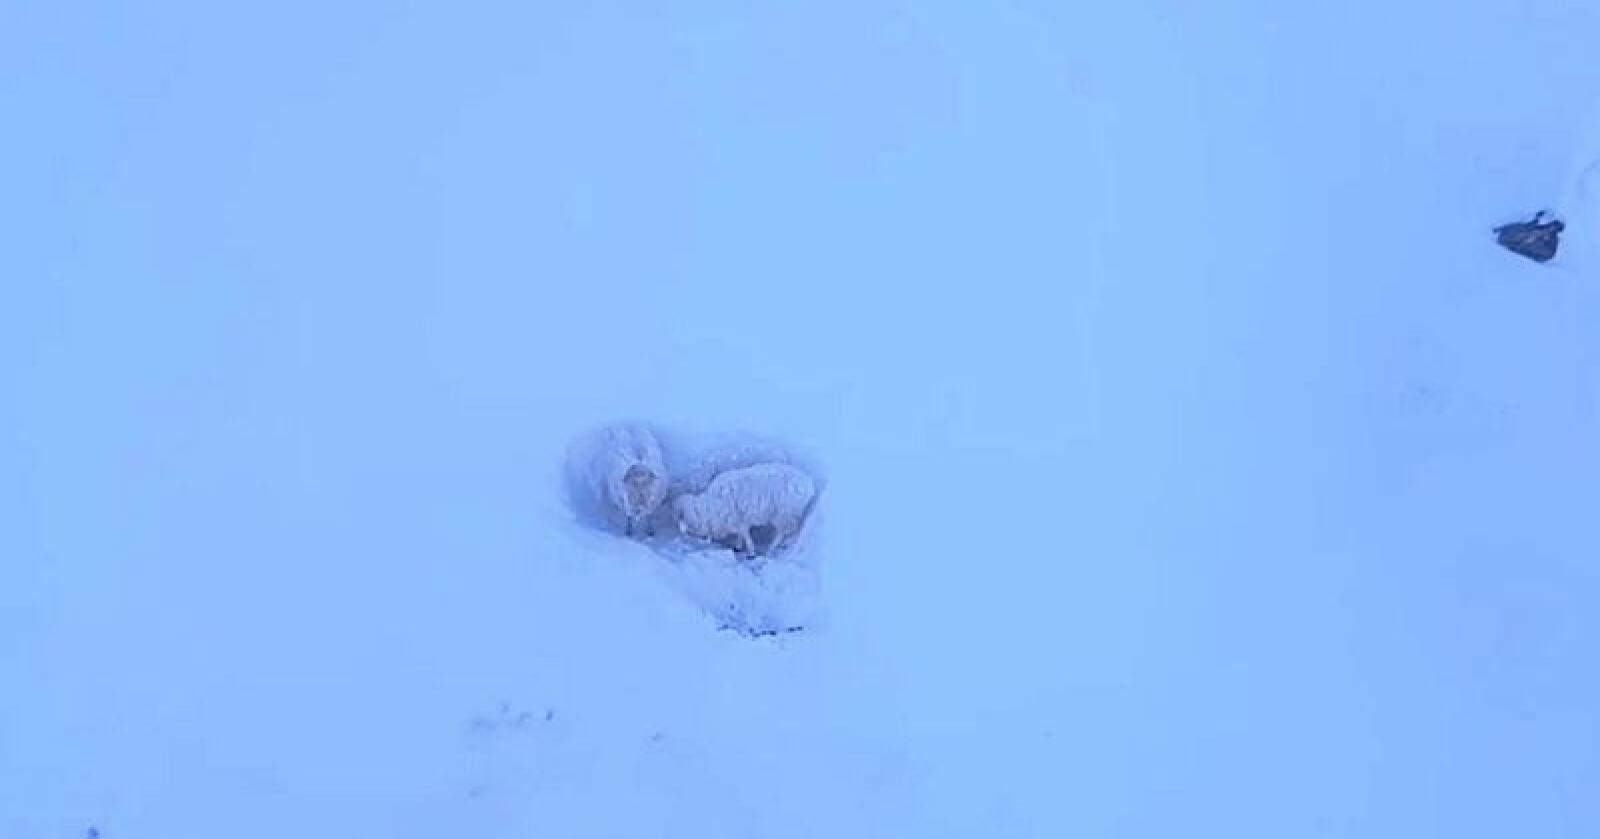 Sauen og de to lammen står bom fast i fjellet. Foto: Bernt-Ole Berntsen